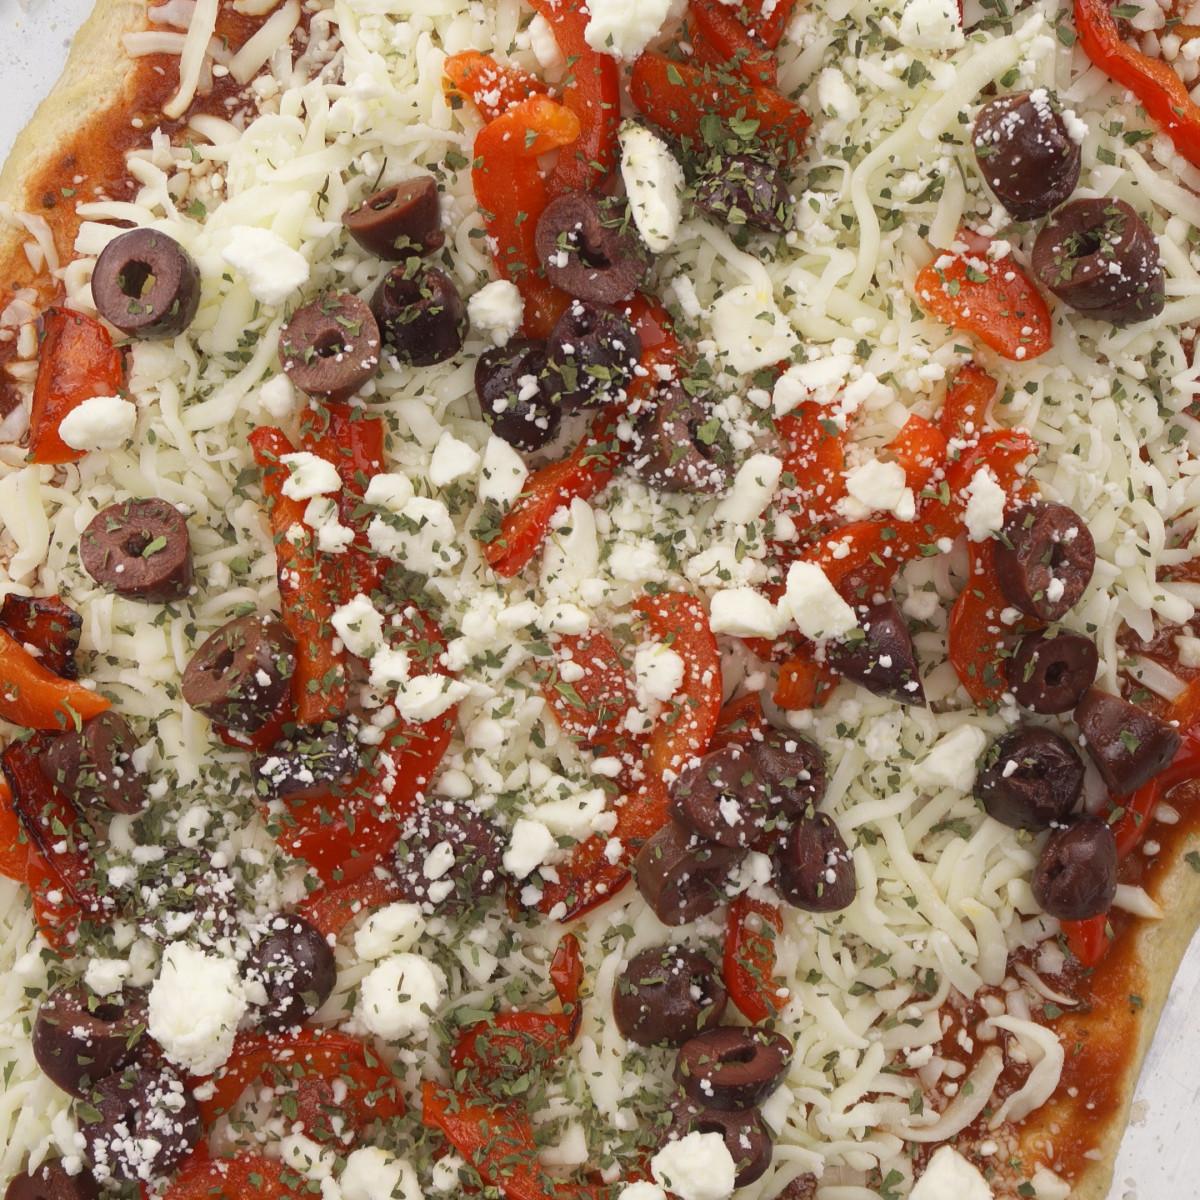 red pepper kalamata olive pizza